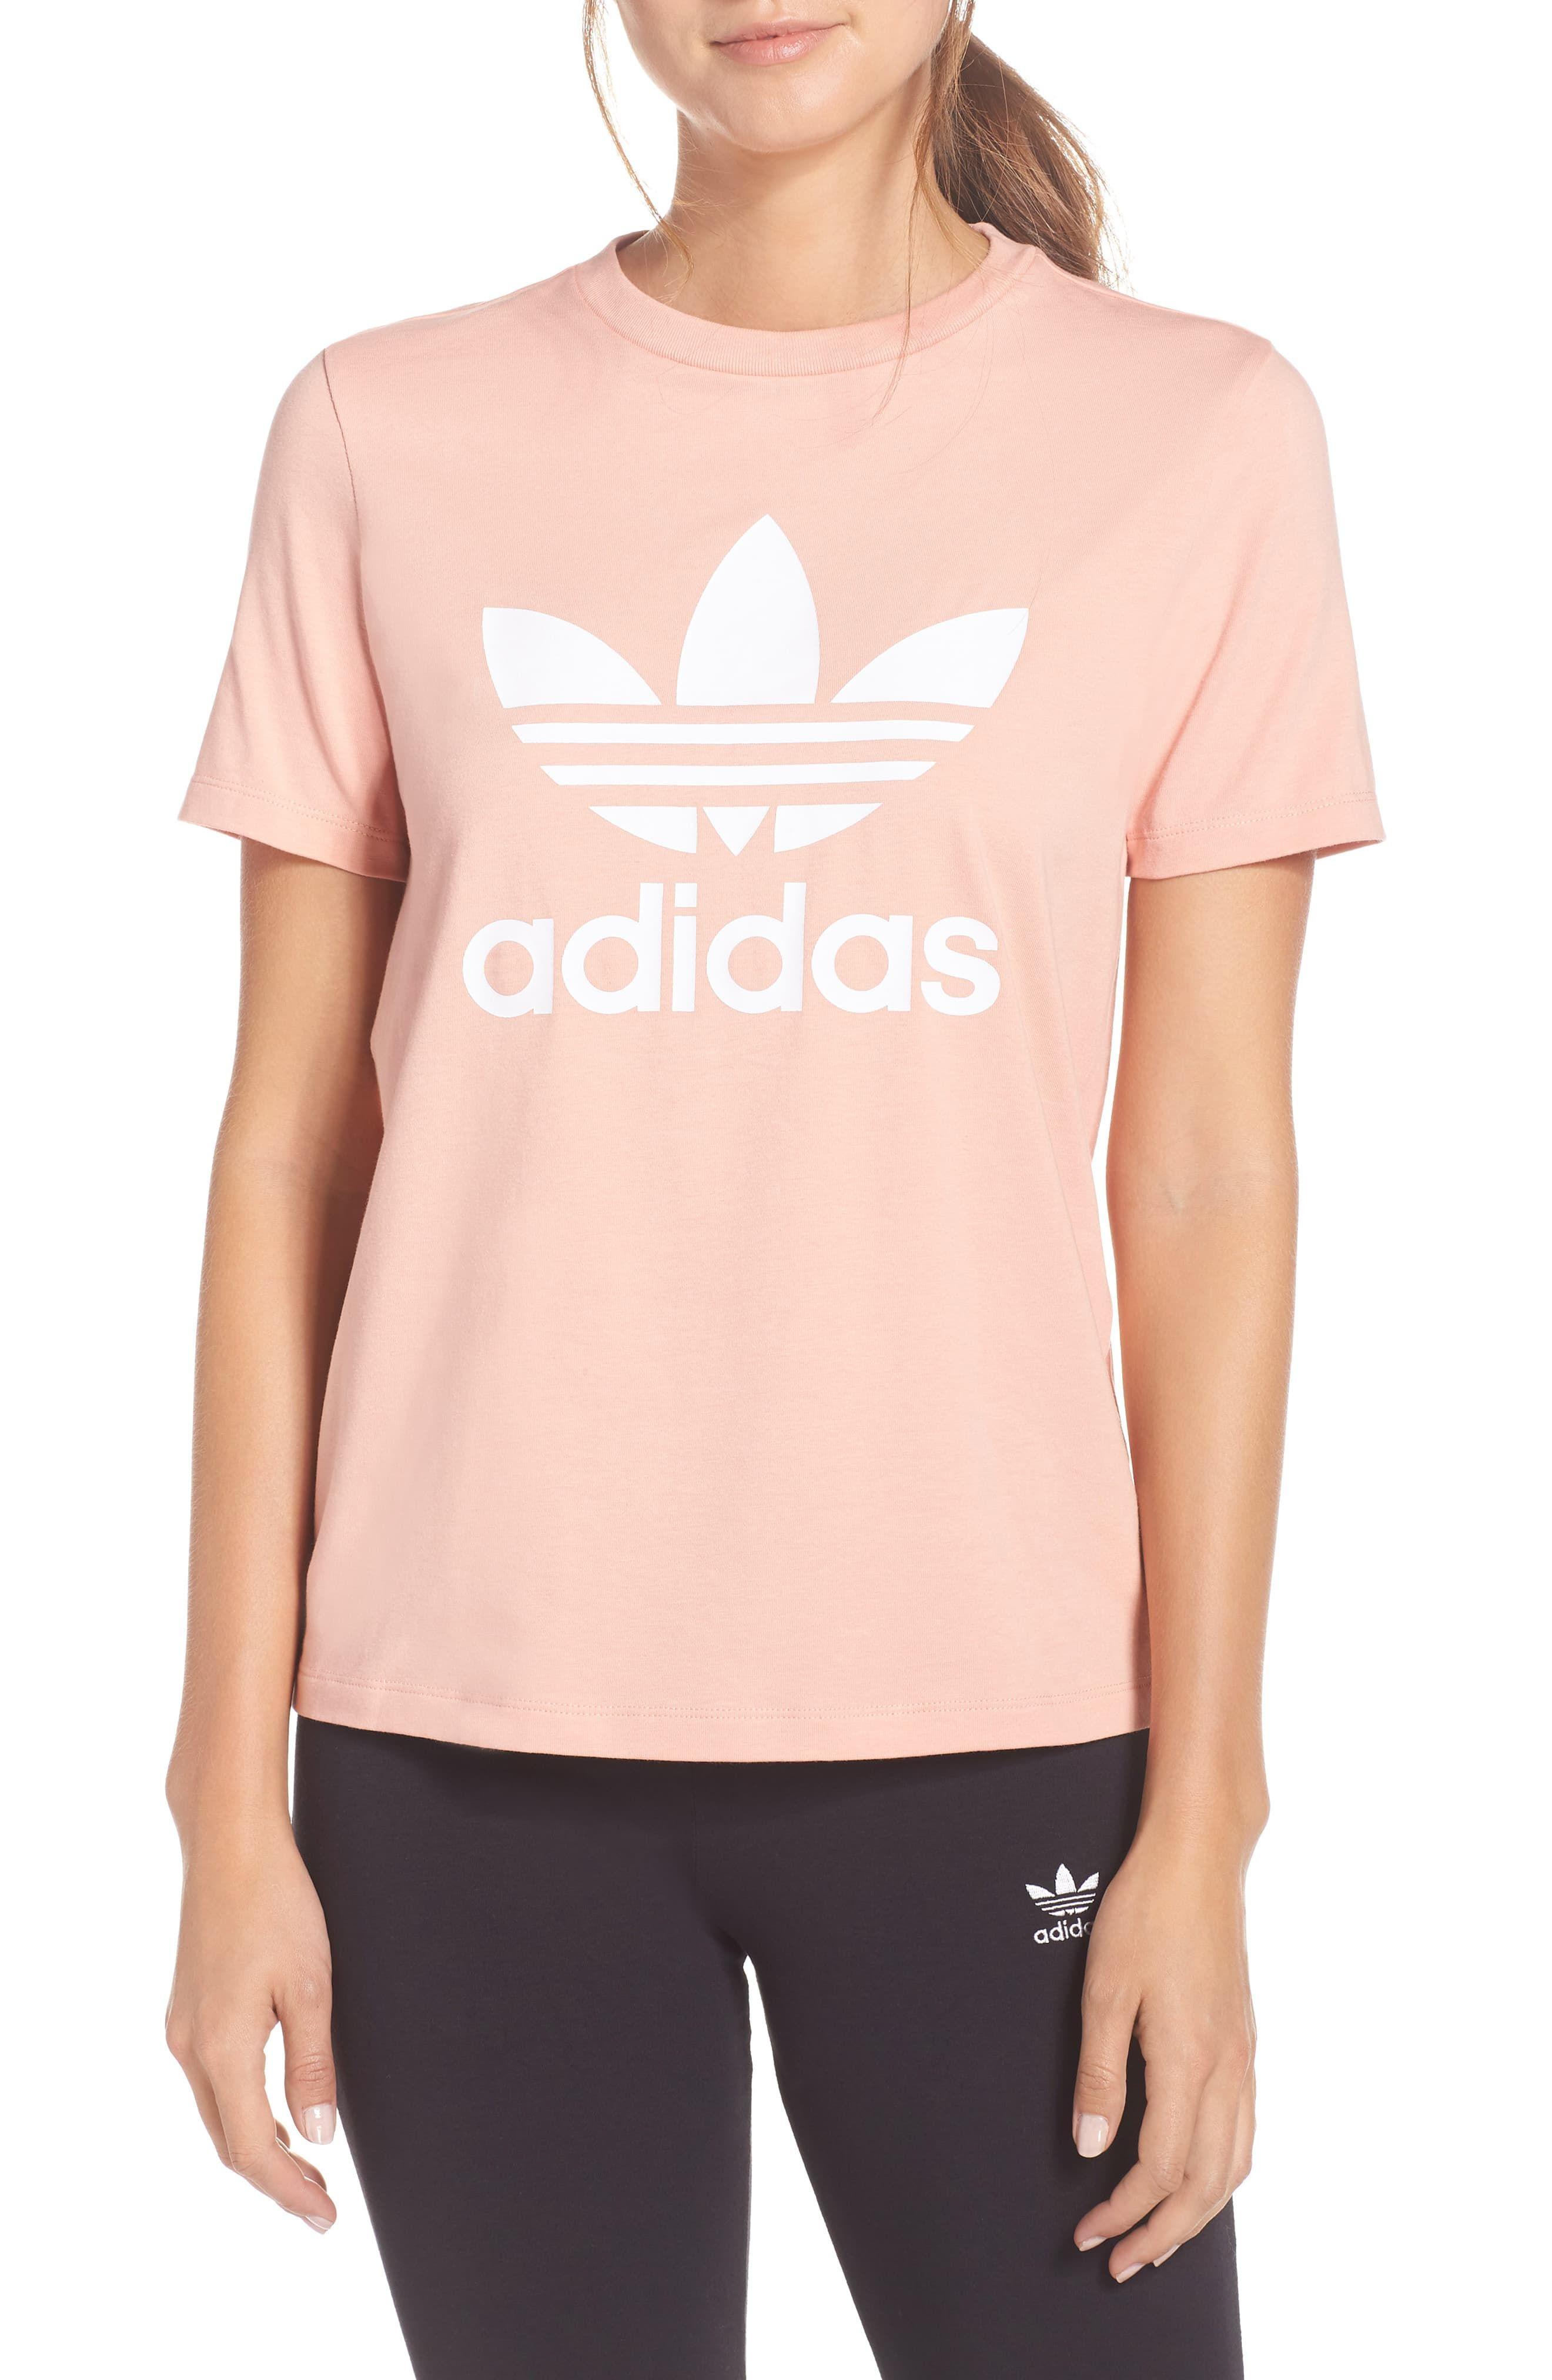 Women's Adidas Trefoil Tee, Size | Adidas shirt women, Nike